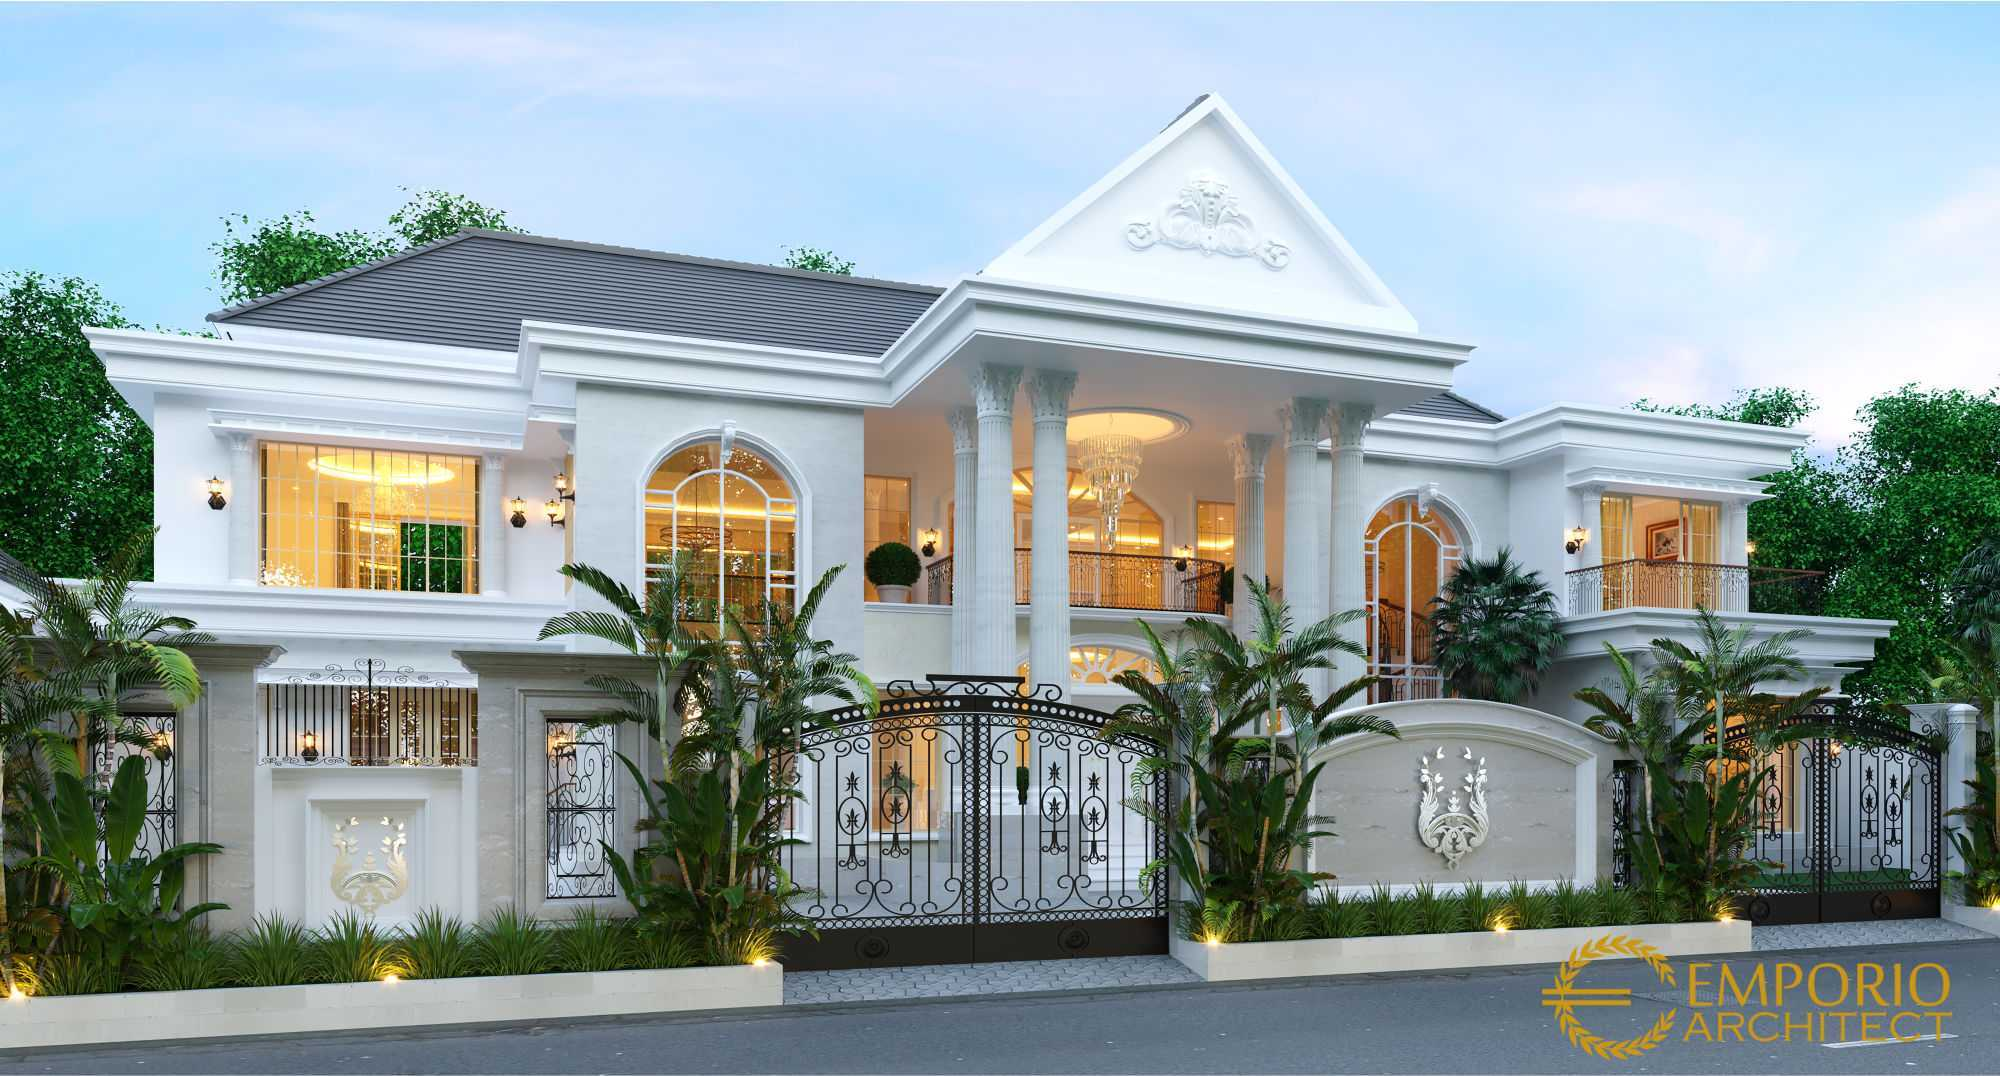 Jasa Arsitek Emporio Architect di Padang